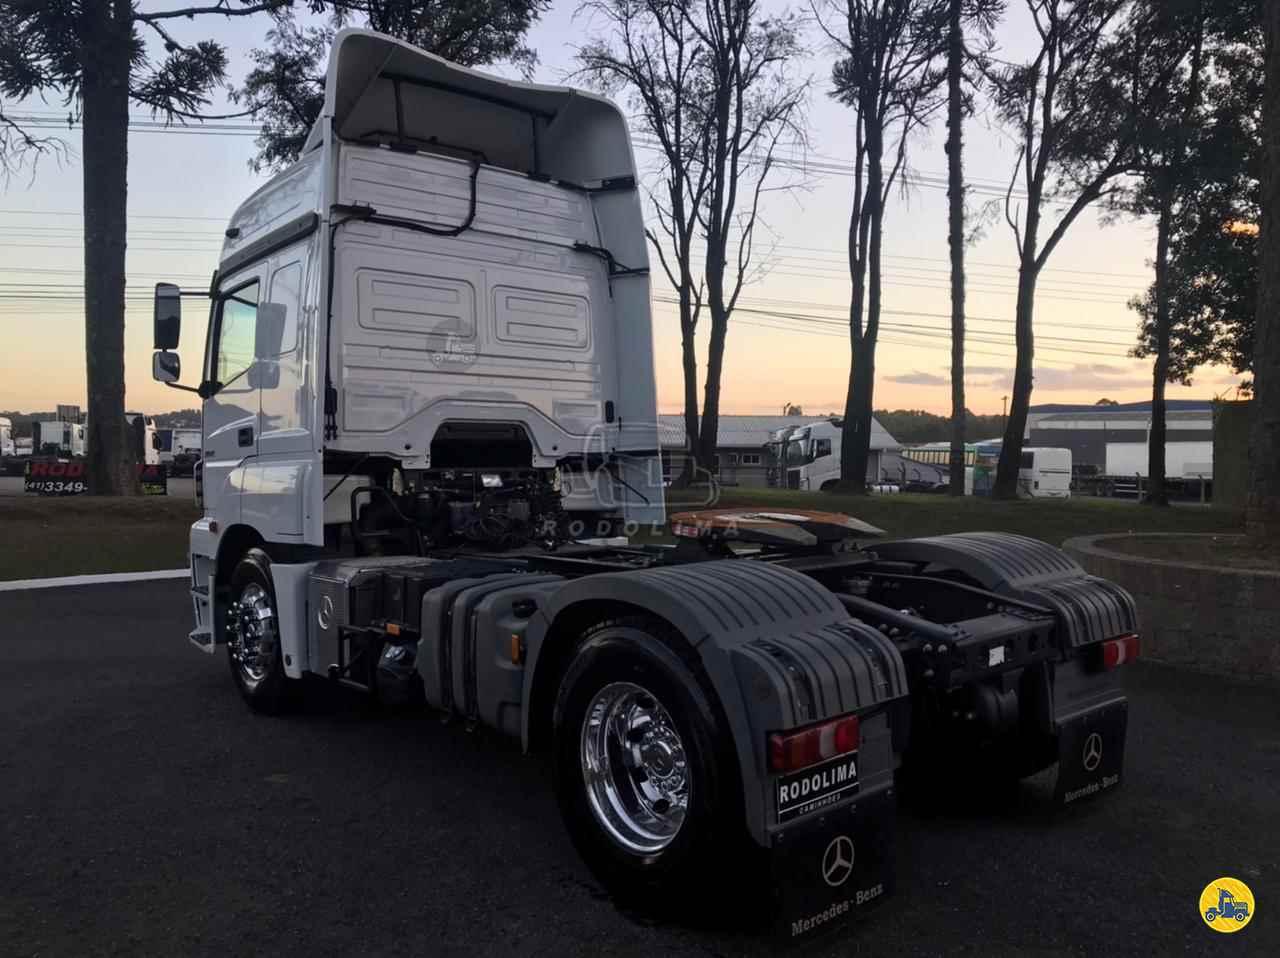 MERCEDES-BENZ MB 2041 398750km 2018/2019 Rodolima Caminhões